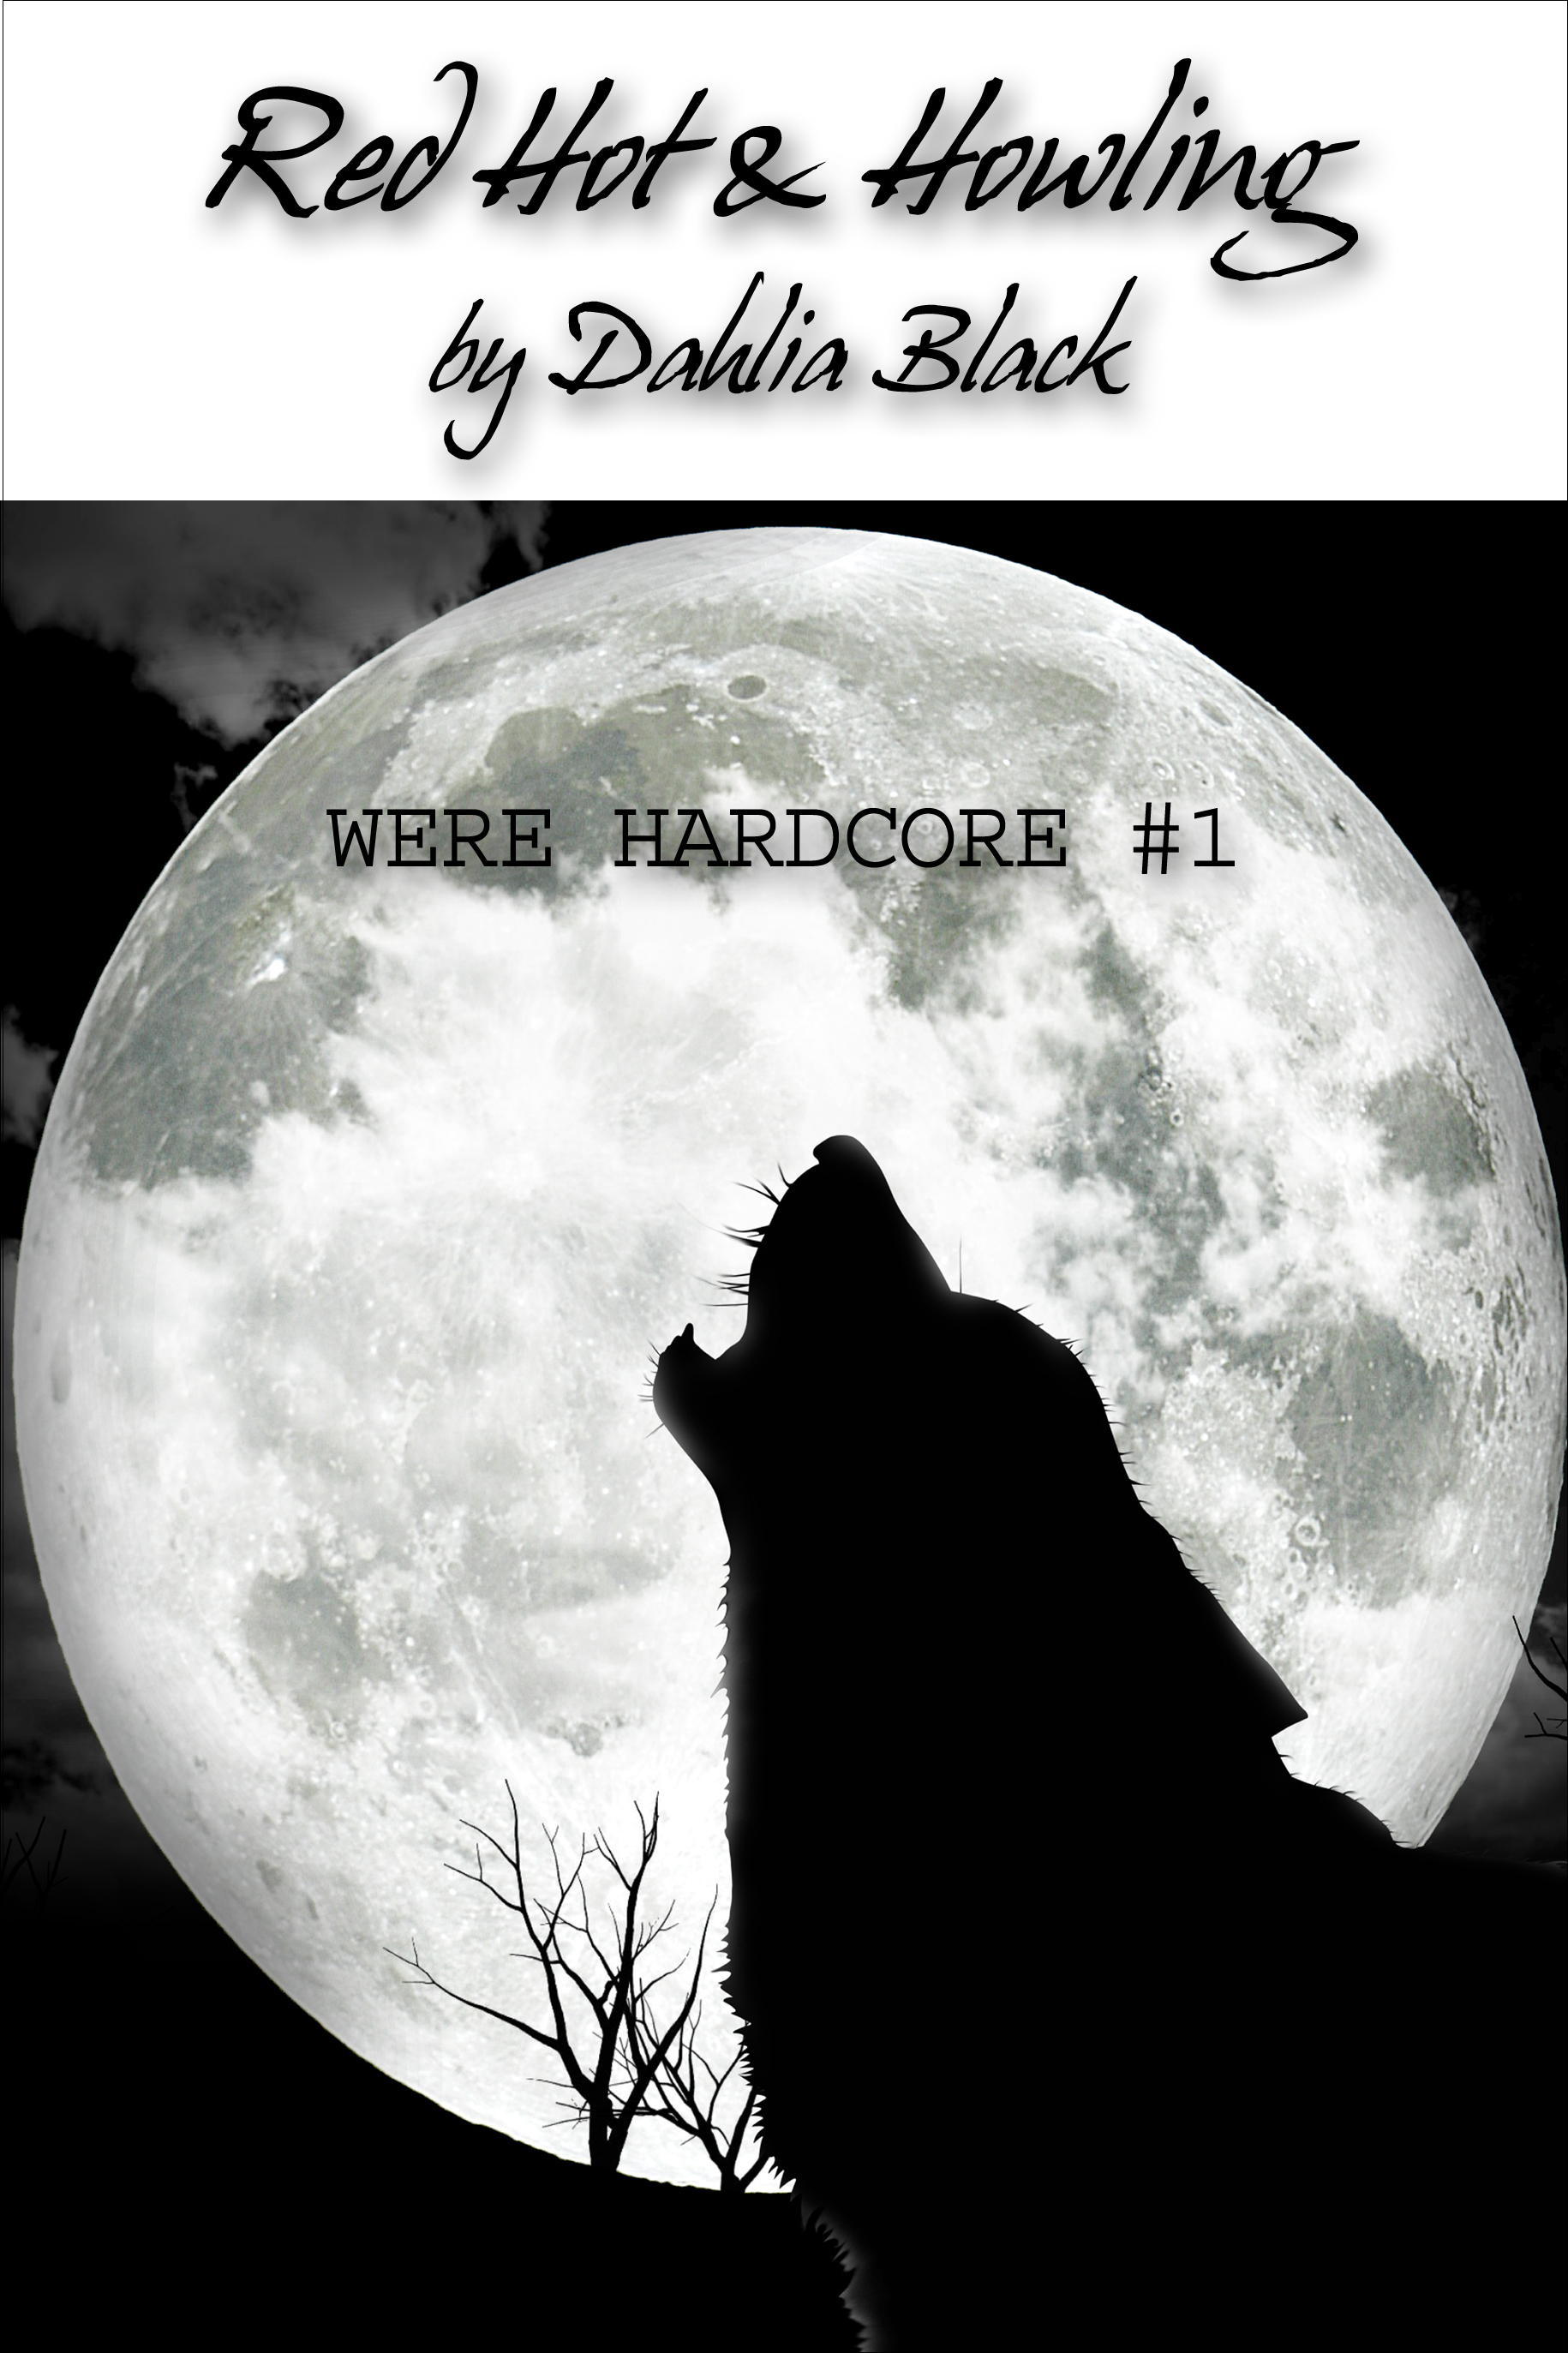 Dahlia Black - Red Hot & Howling - Were Hardcore #1 - Werewolf / ShapeShifter Erotica